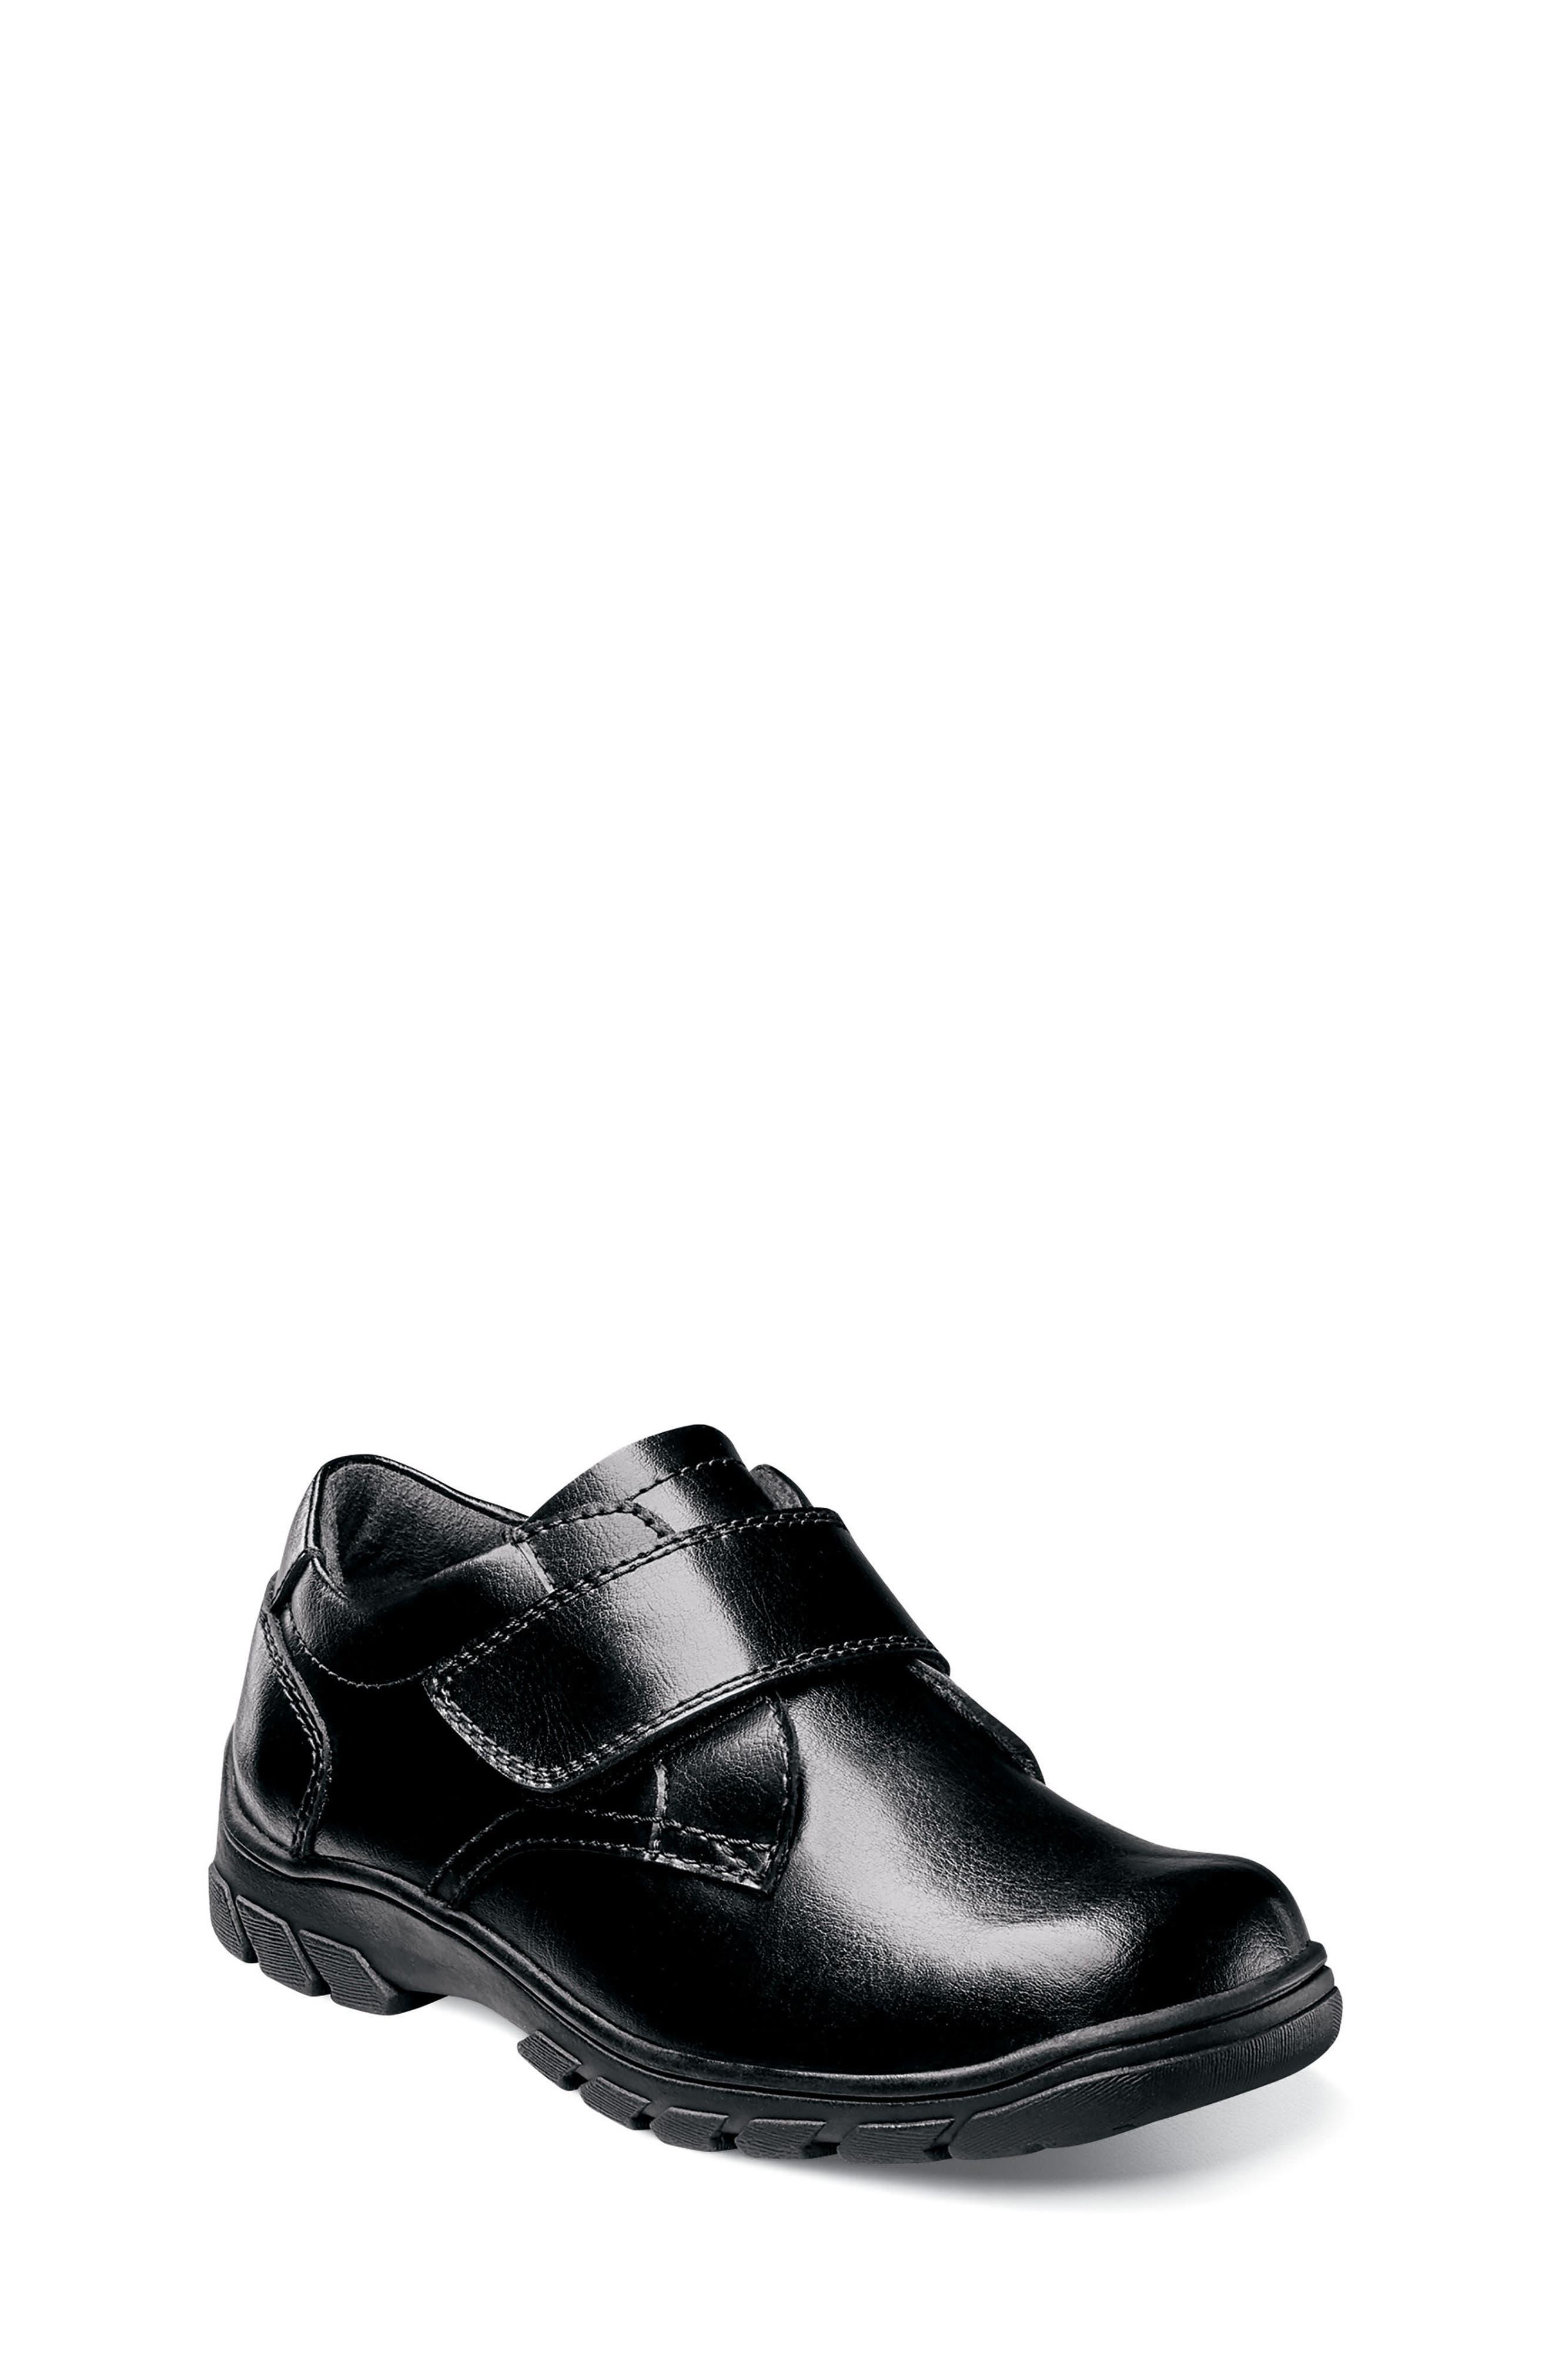 Alternate Image 1 Selected - Florsheim Getaway Strap Jr Shoe (Toddler, Little Kid & Big Kid)